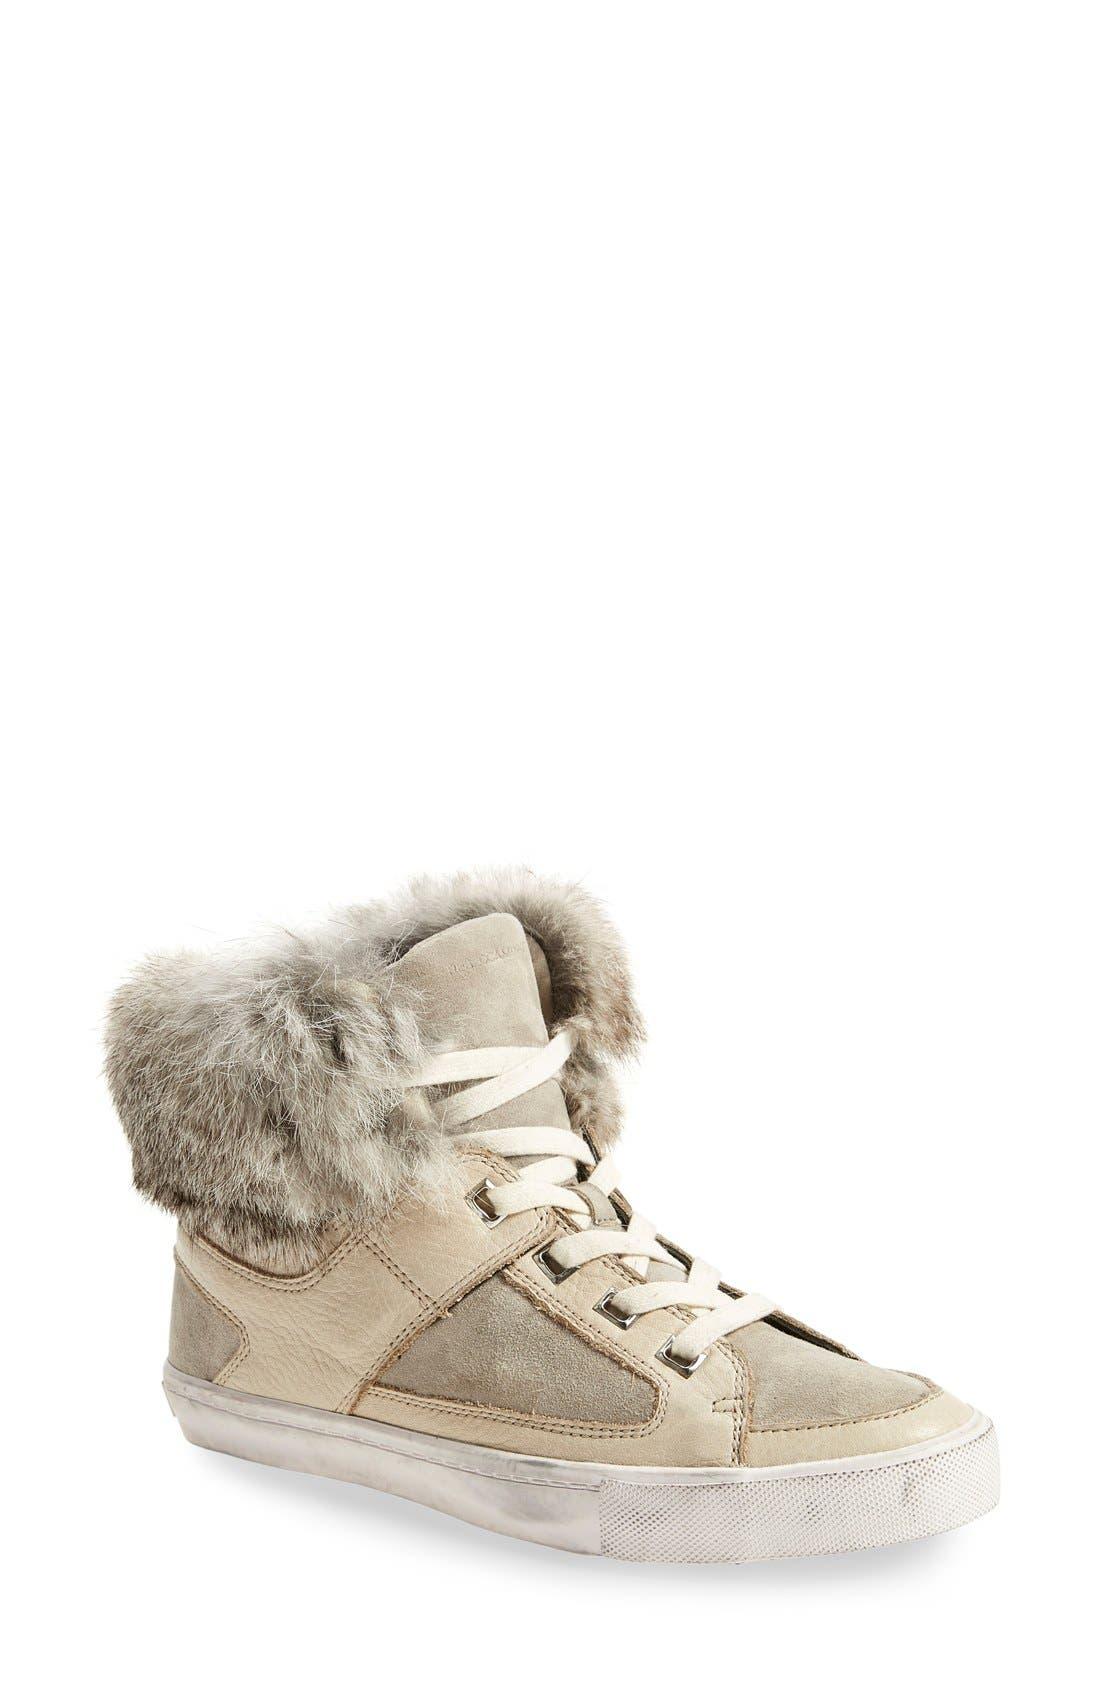 Alternate Image 1 Selected - Rebecca Minkoff'Shiloh' Genuine Rabbit Fur CollarSneaker (Women)